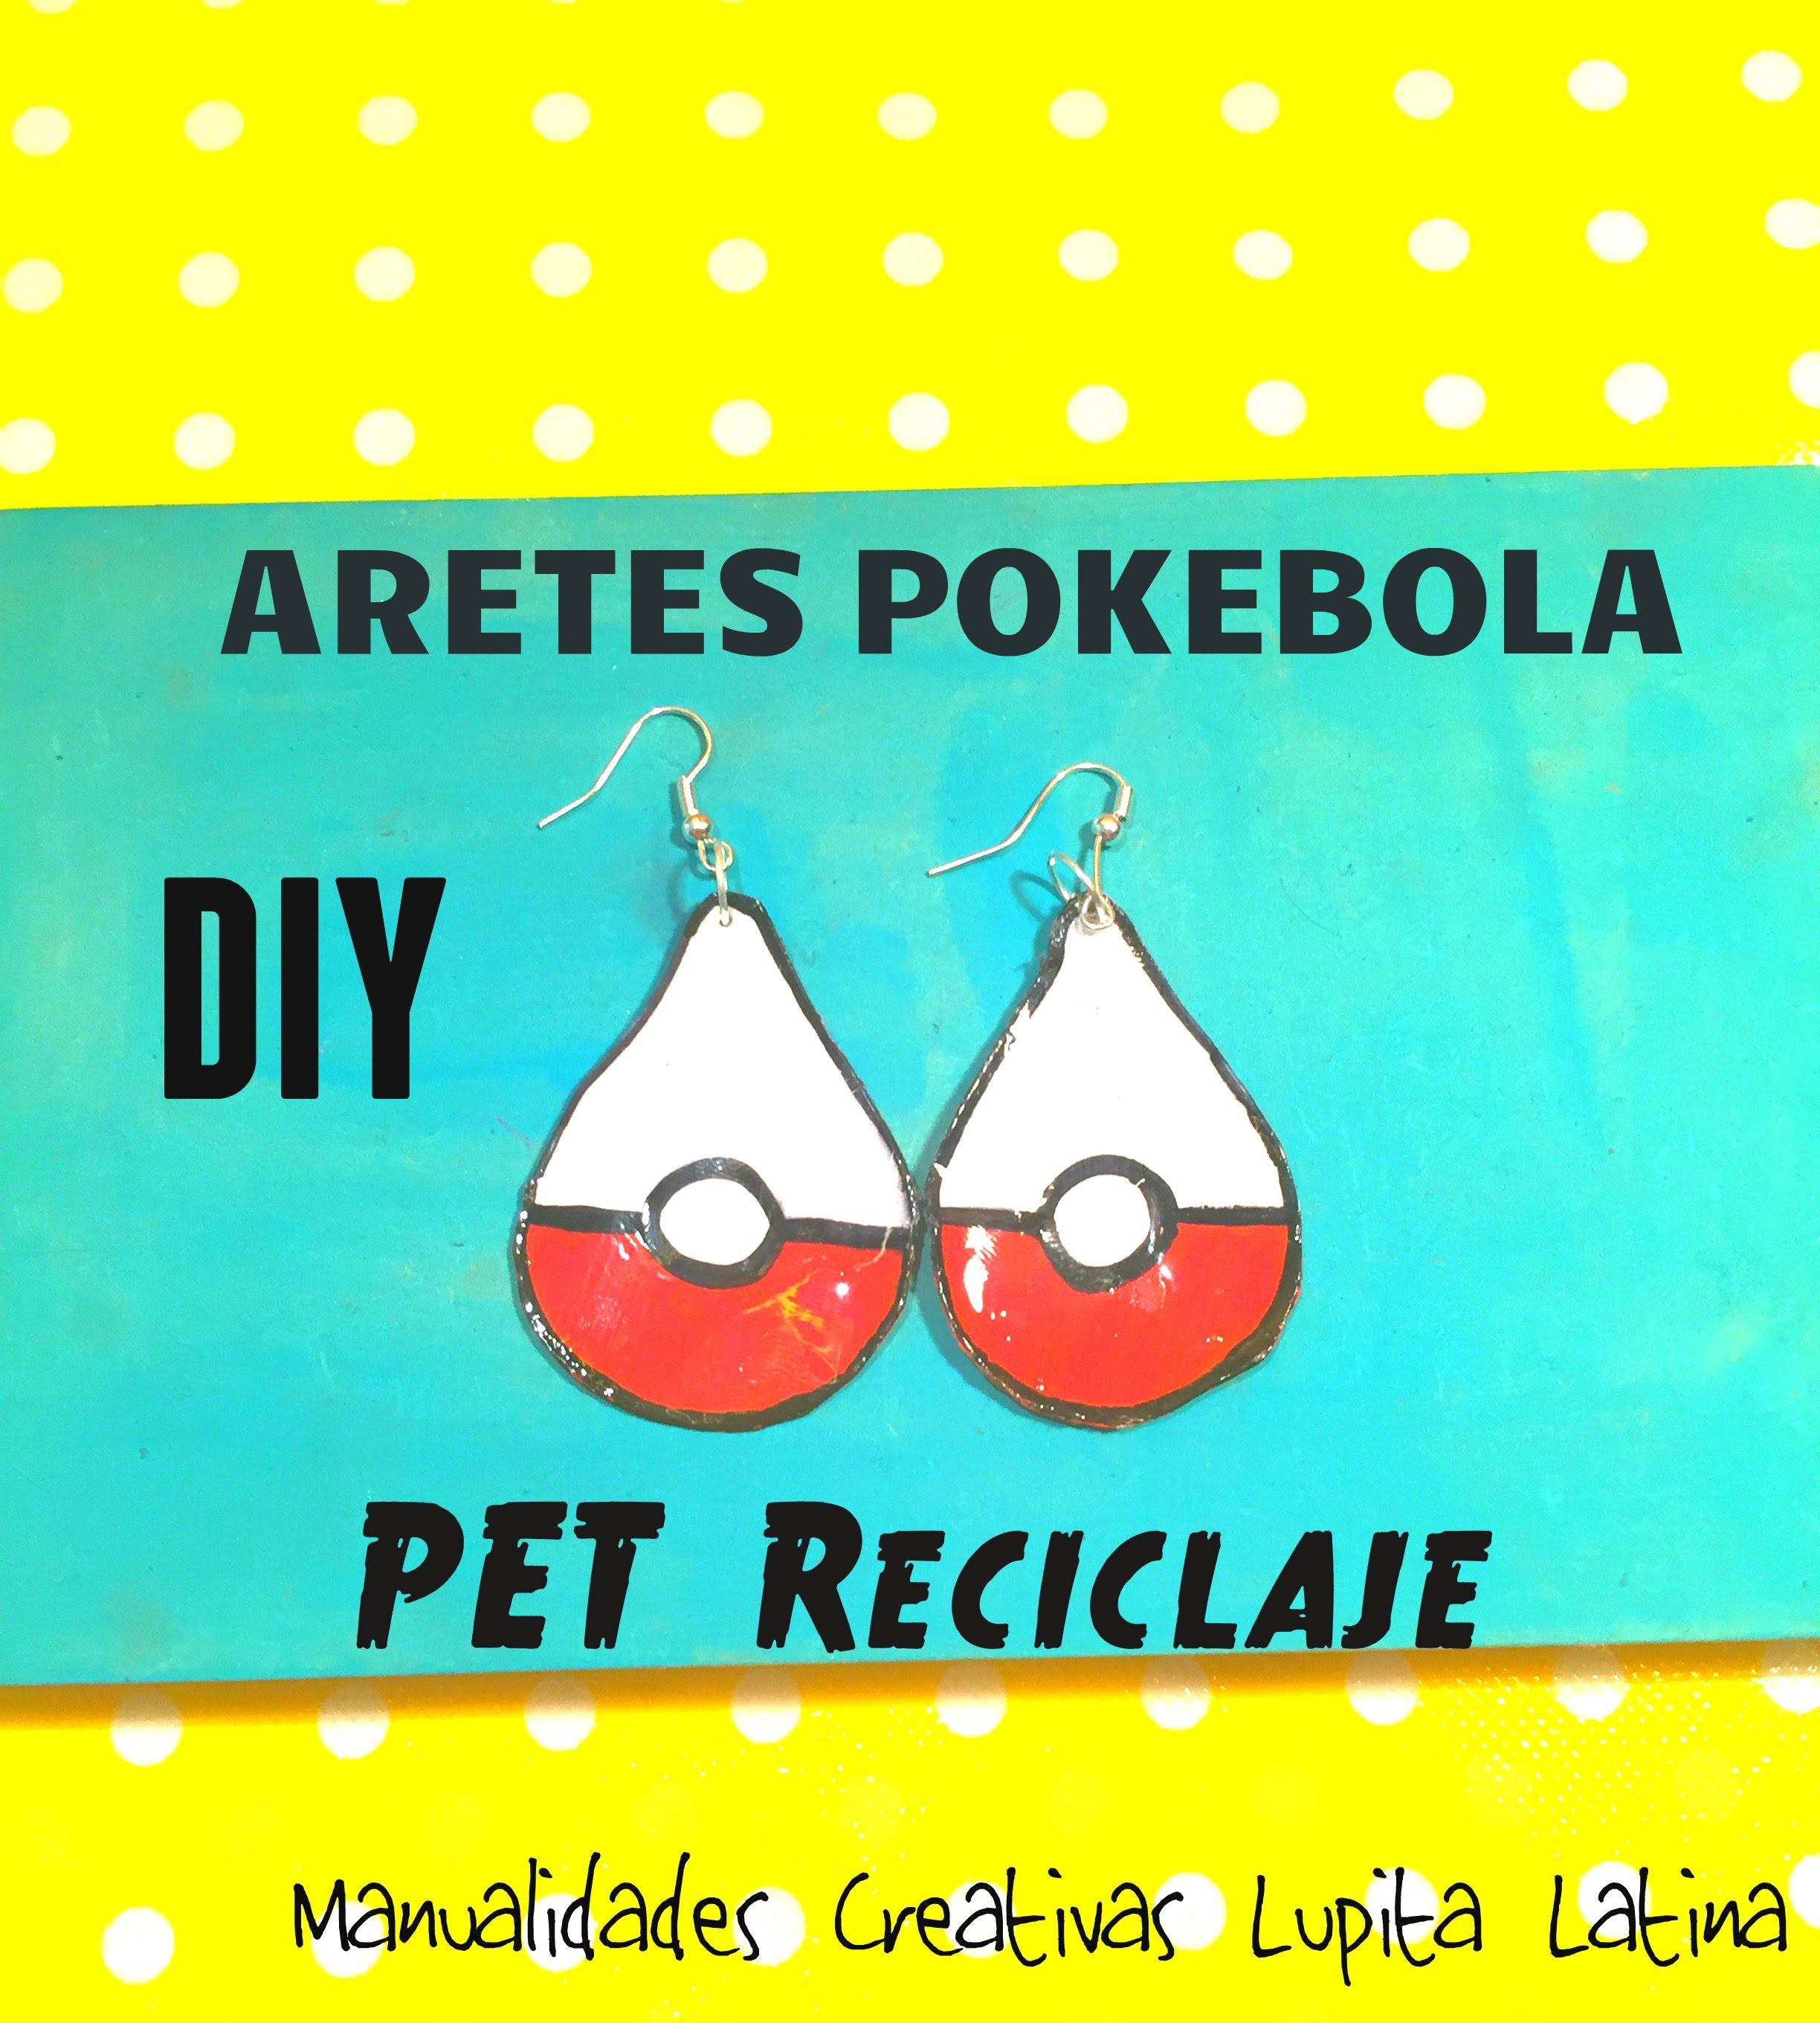 DIY POLEMON POKEBOLA Aretes PET reciclaje Pokebola pet earrings